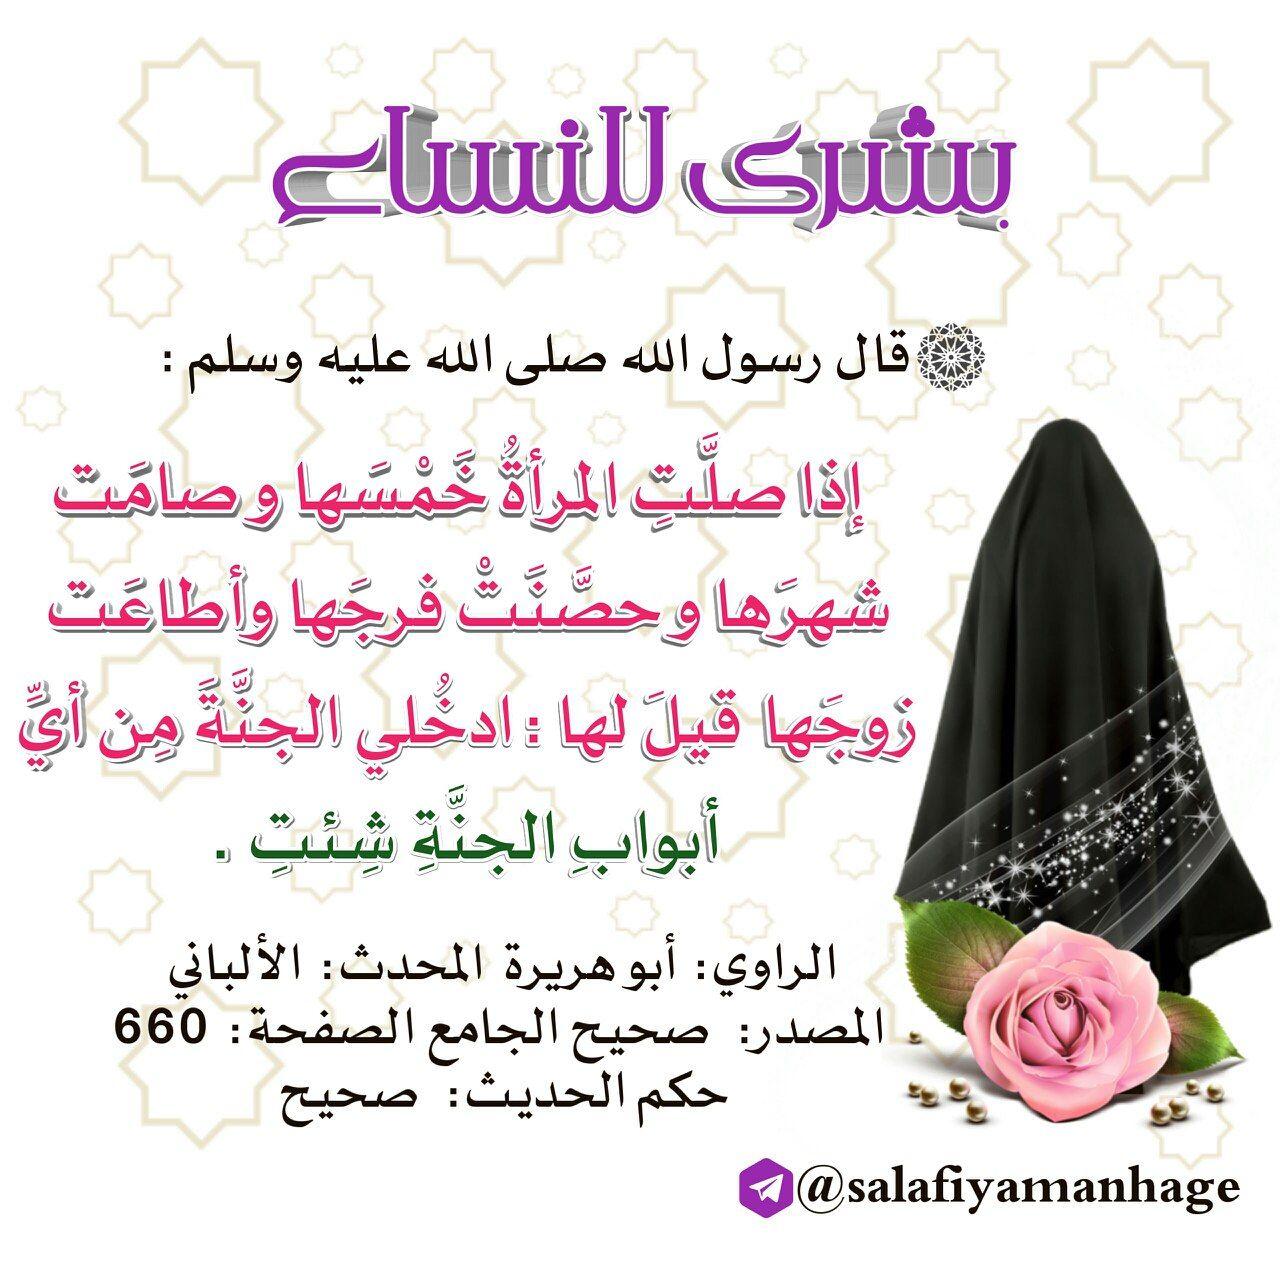 Pin By المرأة المسلمة On مواعظ ونصائح للأخوات Ribbon Slides Ribbon Sandals